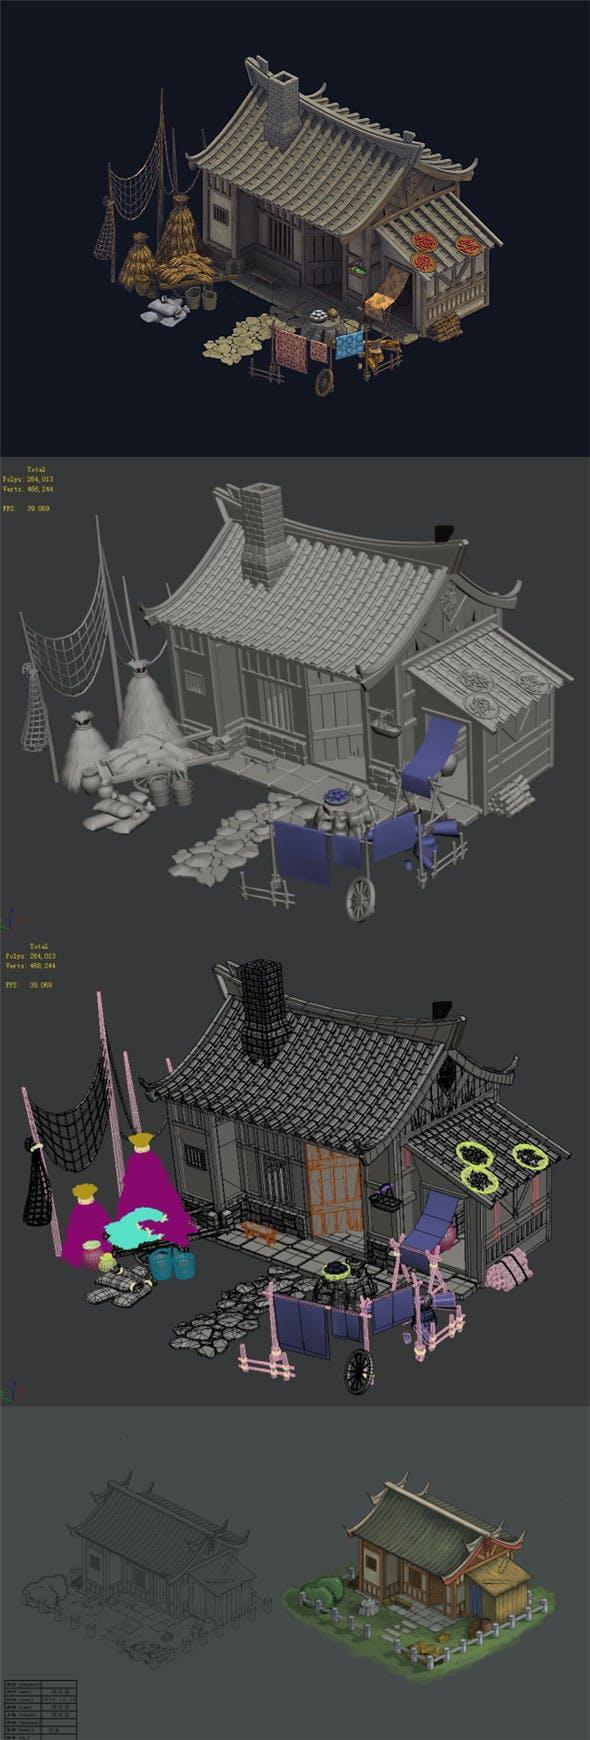 Countryside - Farmhouse 02 - 3DOcean Item for Sale